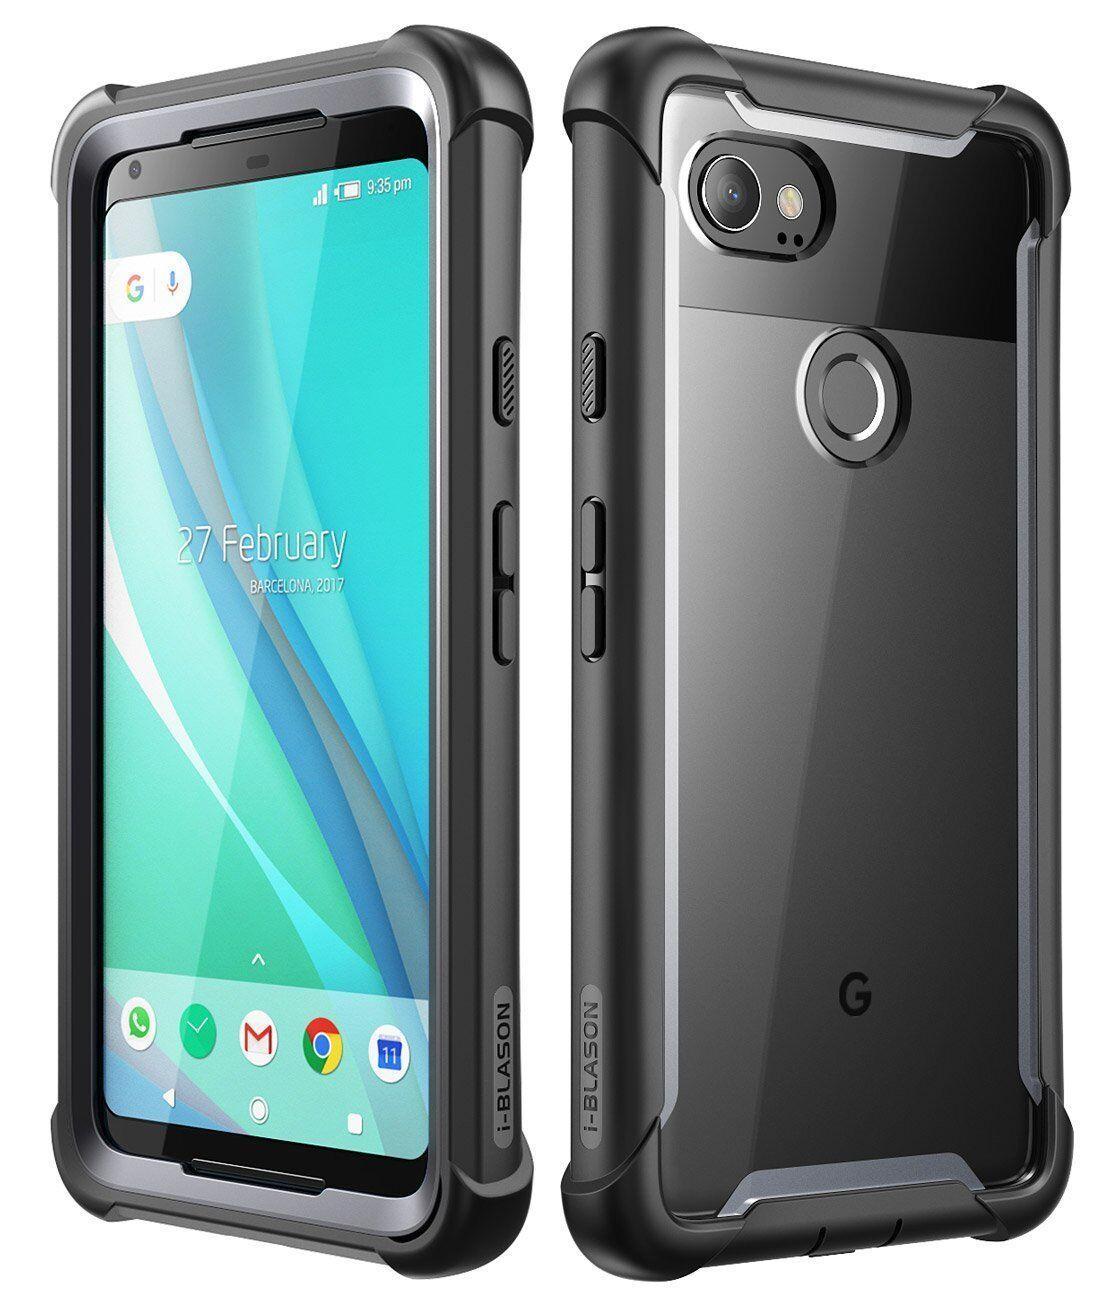 newest f660b e51d8 Чехол для мобильного телефона Google Pixel 2 XL case i-Blason Ares  Full-Body Bumper Cover w/ Screen Protector